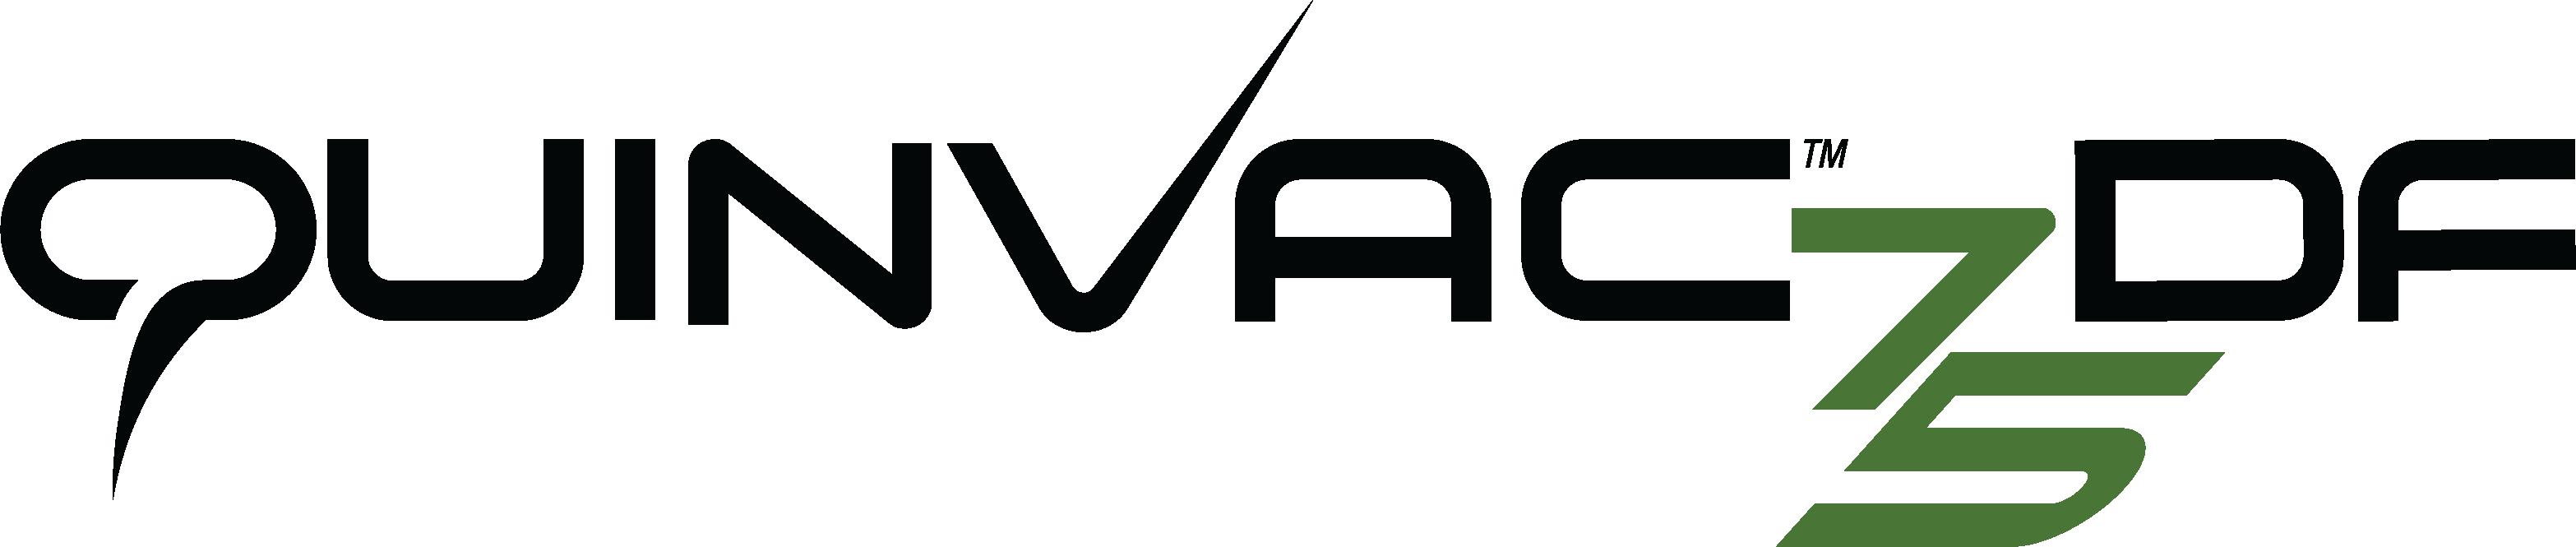 Civility Extra Logo